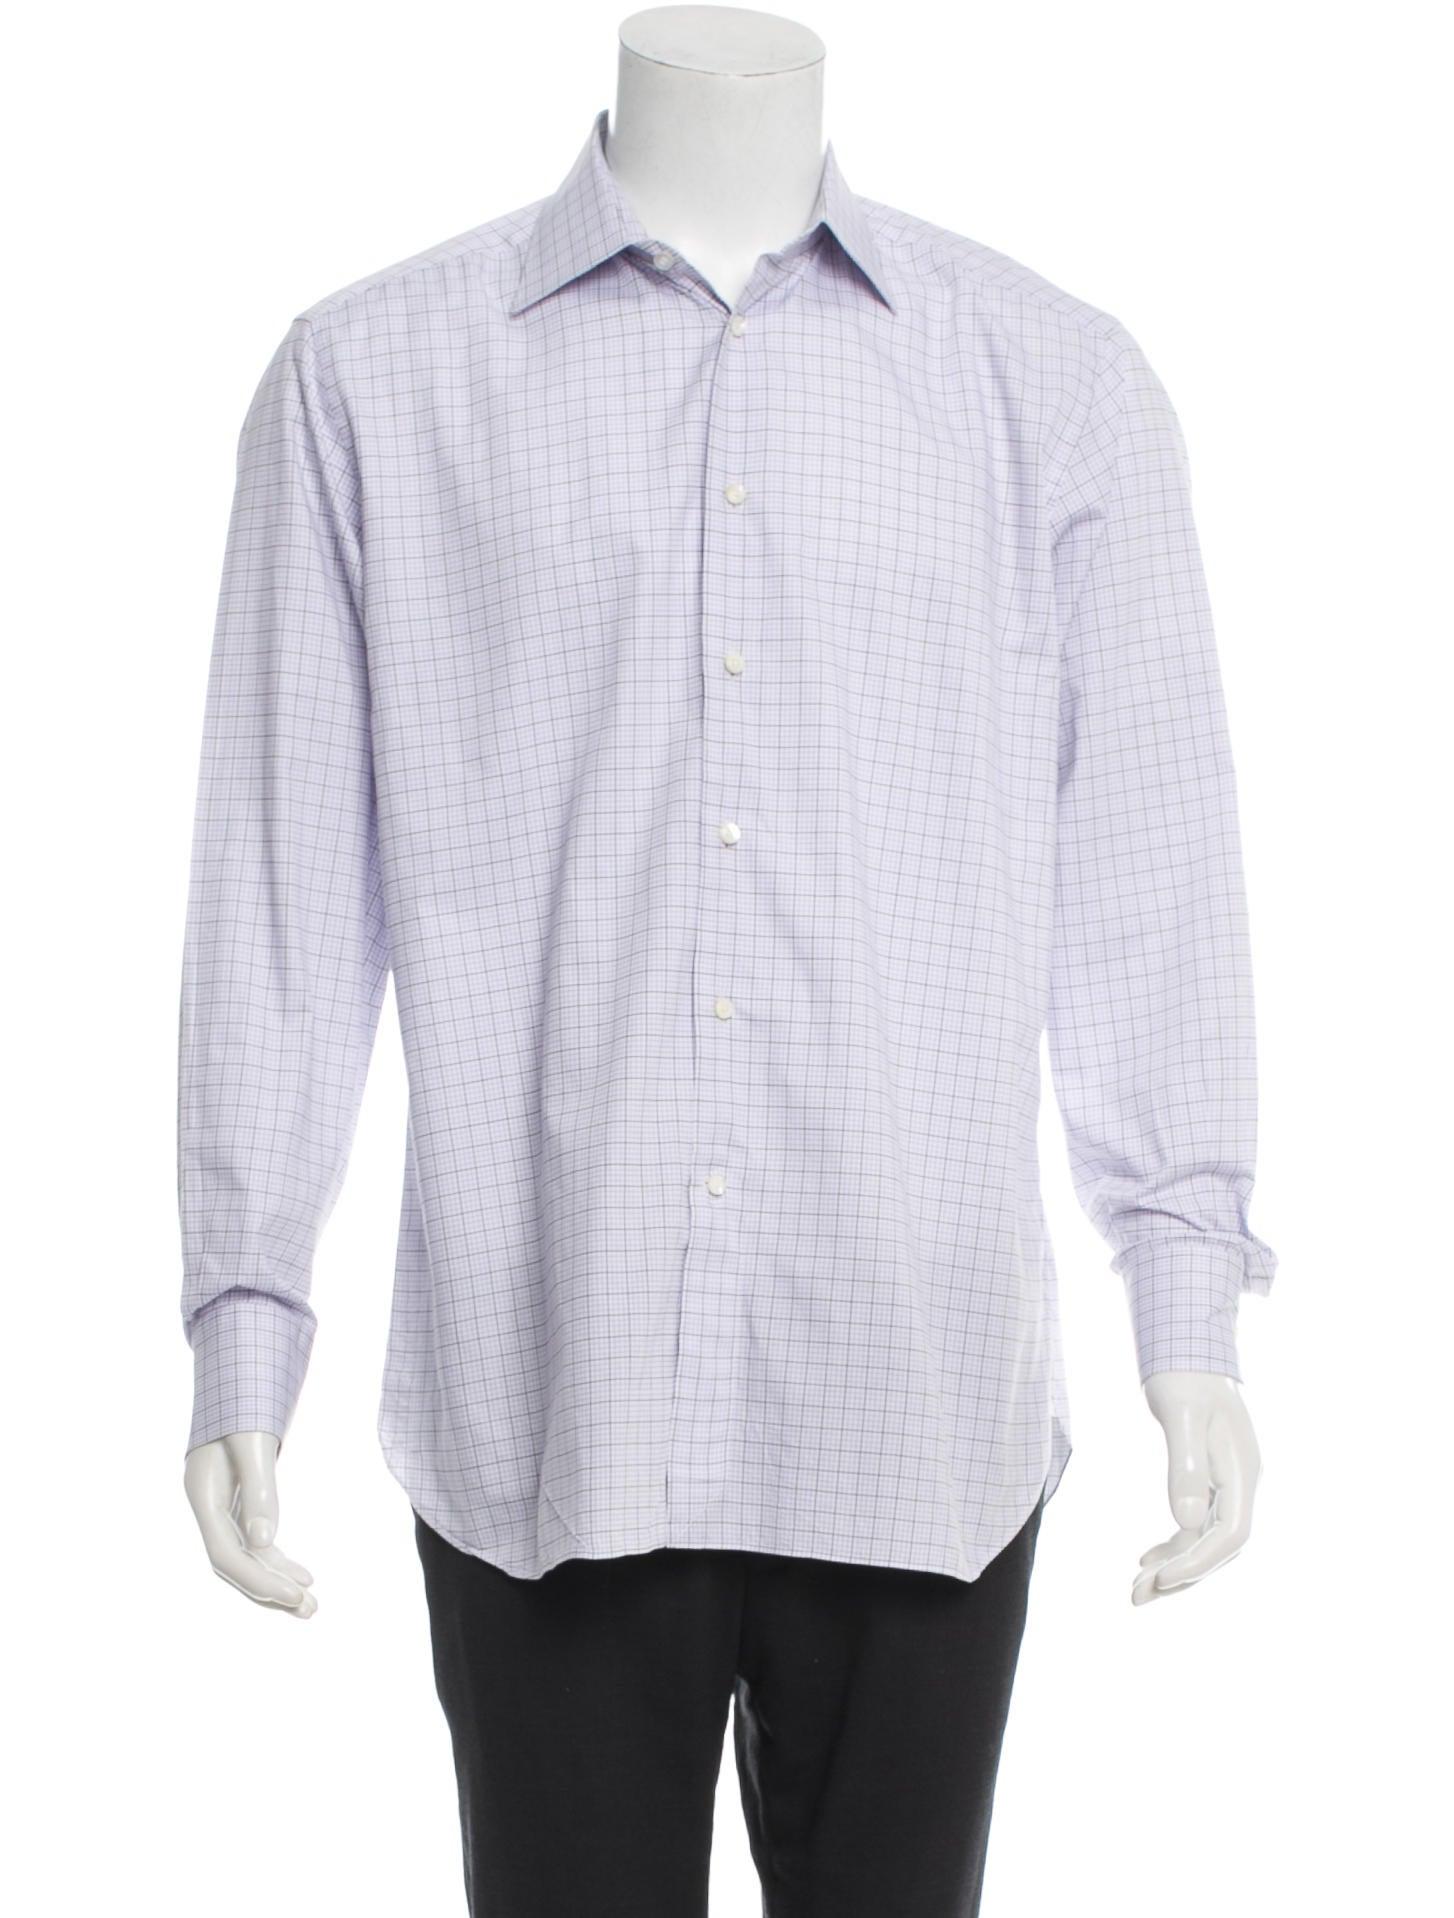 ermenegildo zegna long sleeve button up shirt clothing zgn22487 the realreal. Black Bedroom Furniture Sets. Home Design Ideas